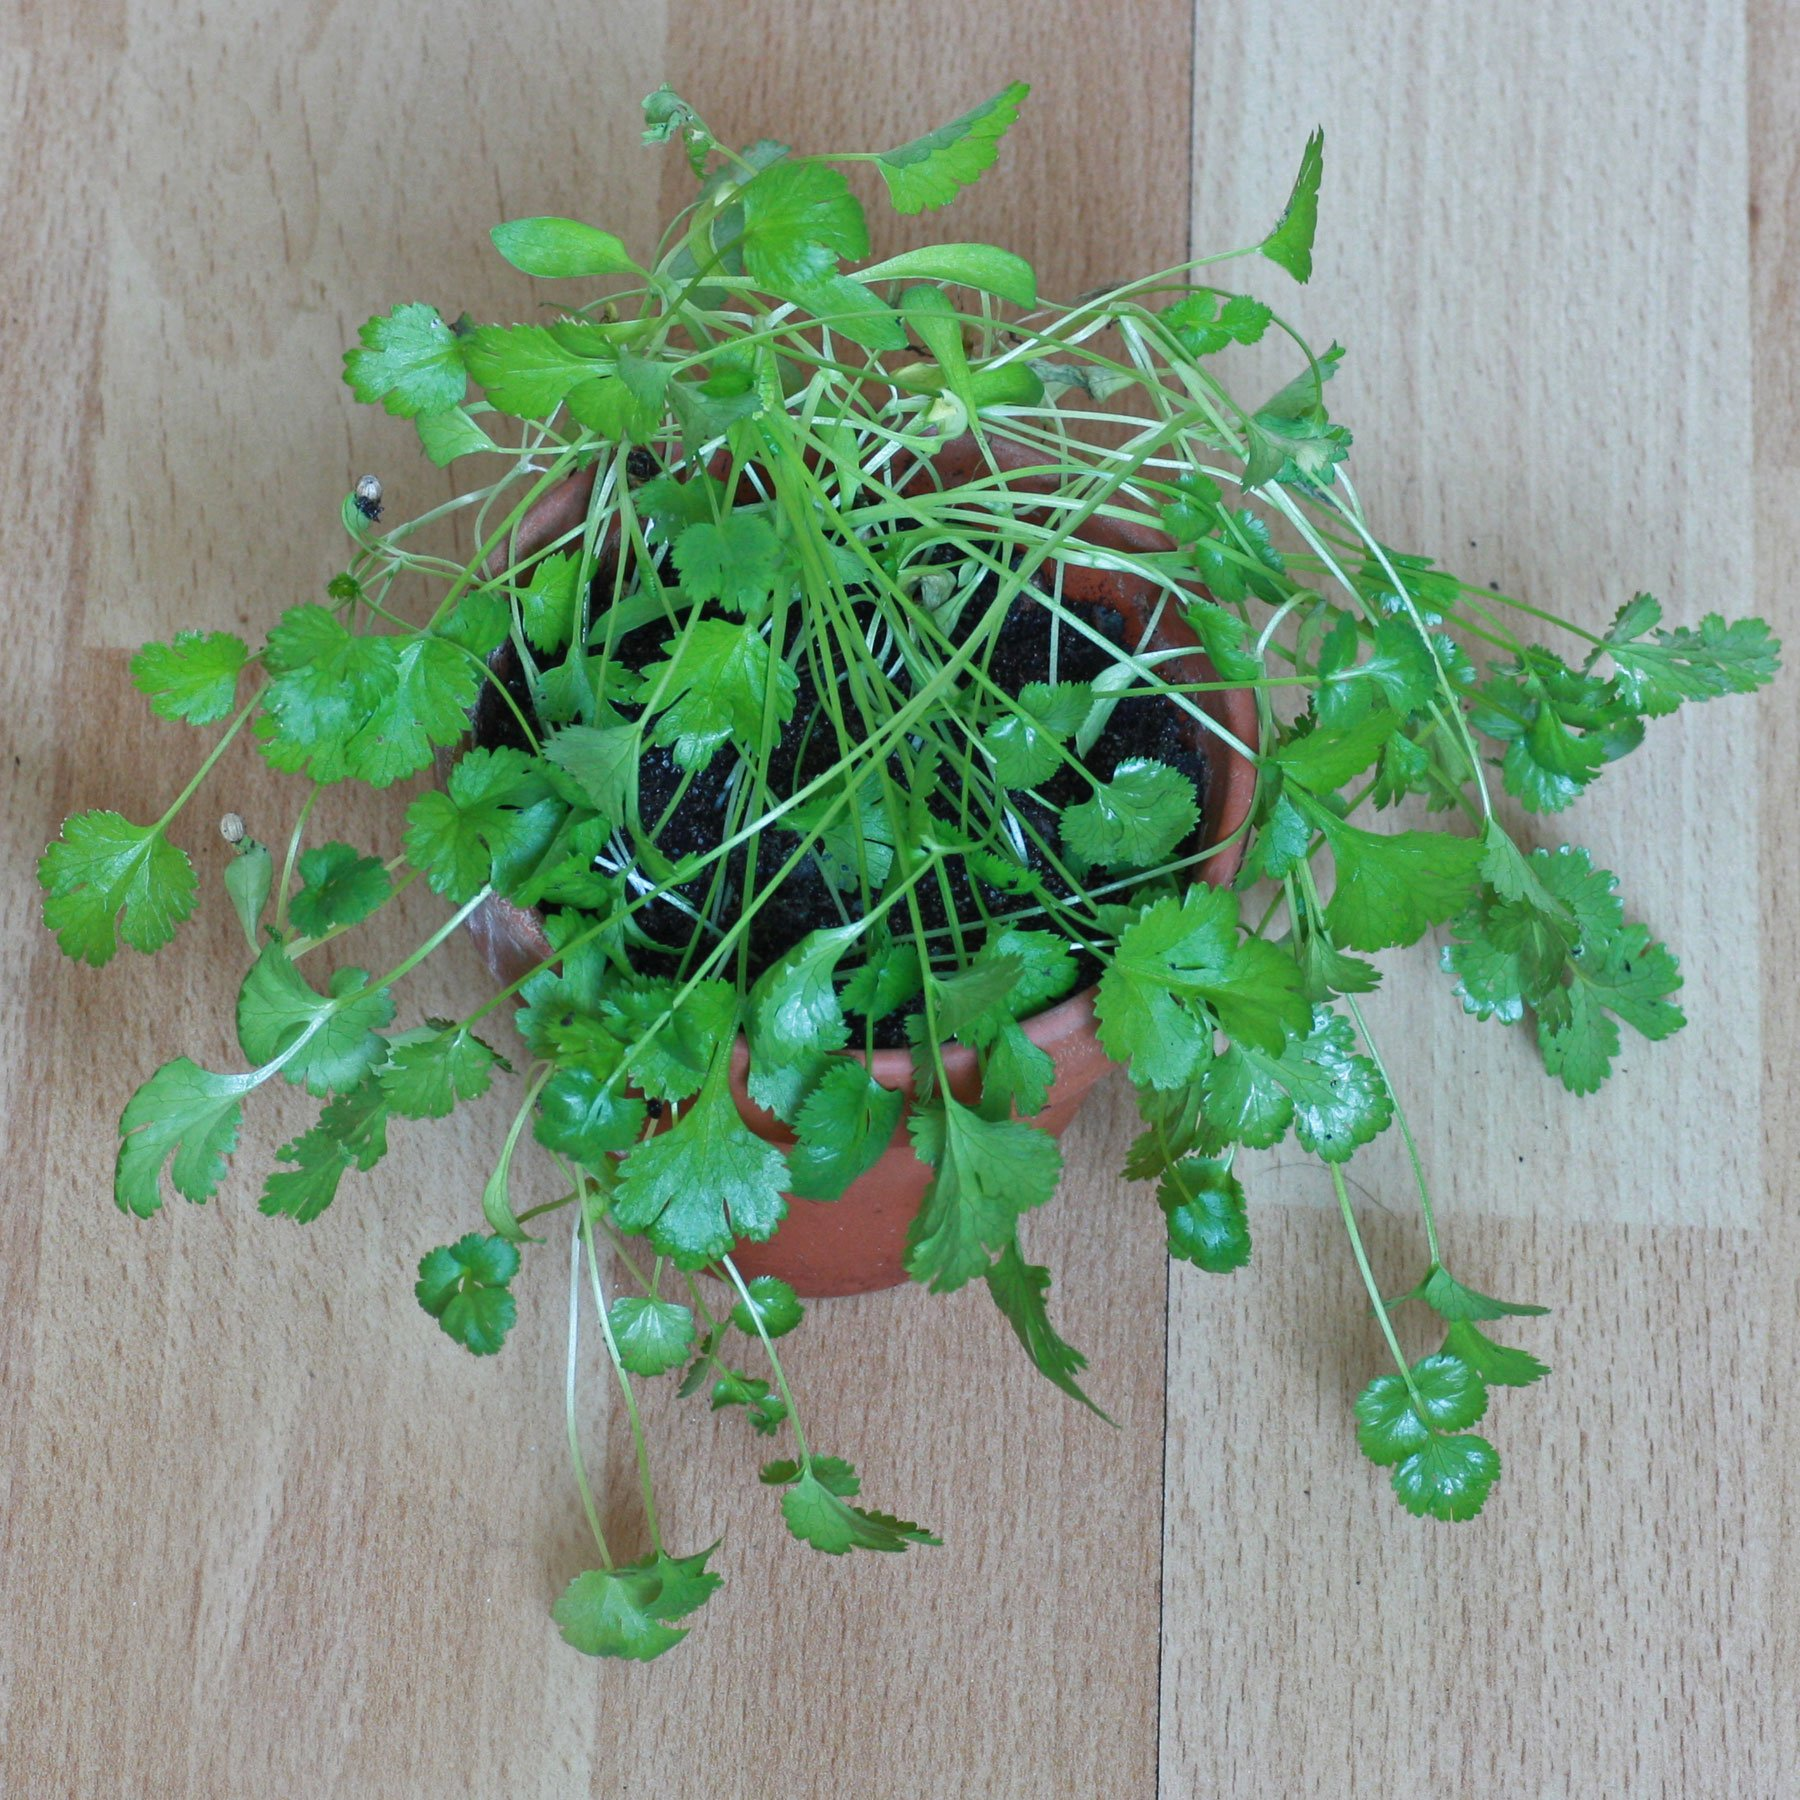 Korianderpflanzen